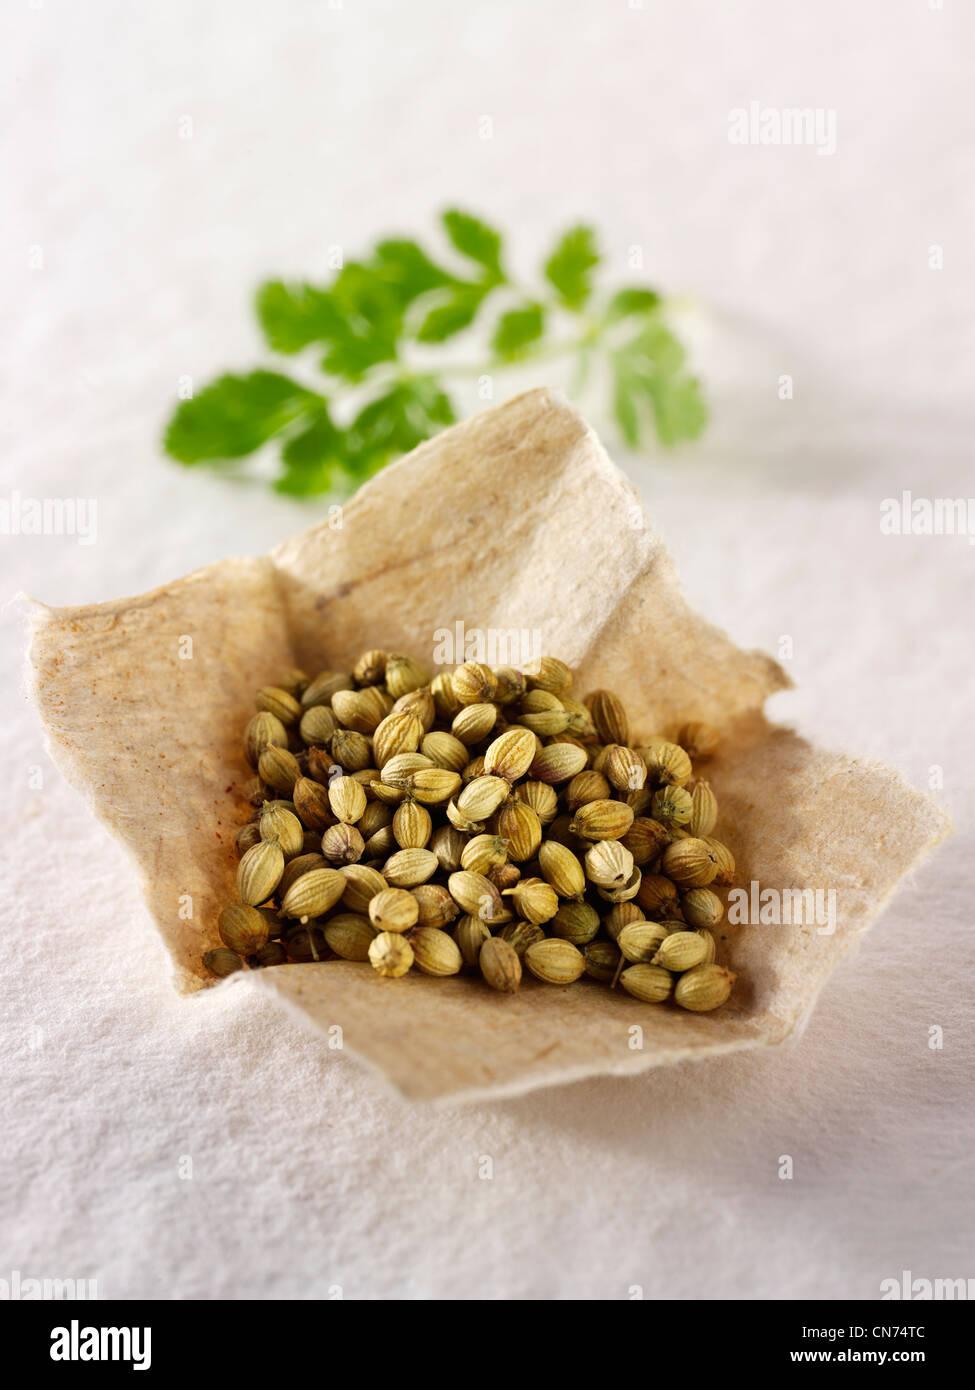 Corinader seeds & coriander leaves composed arrangement Stock Photo